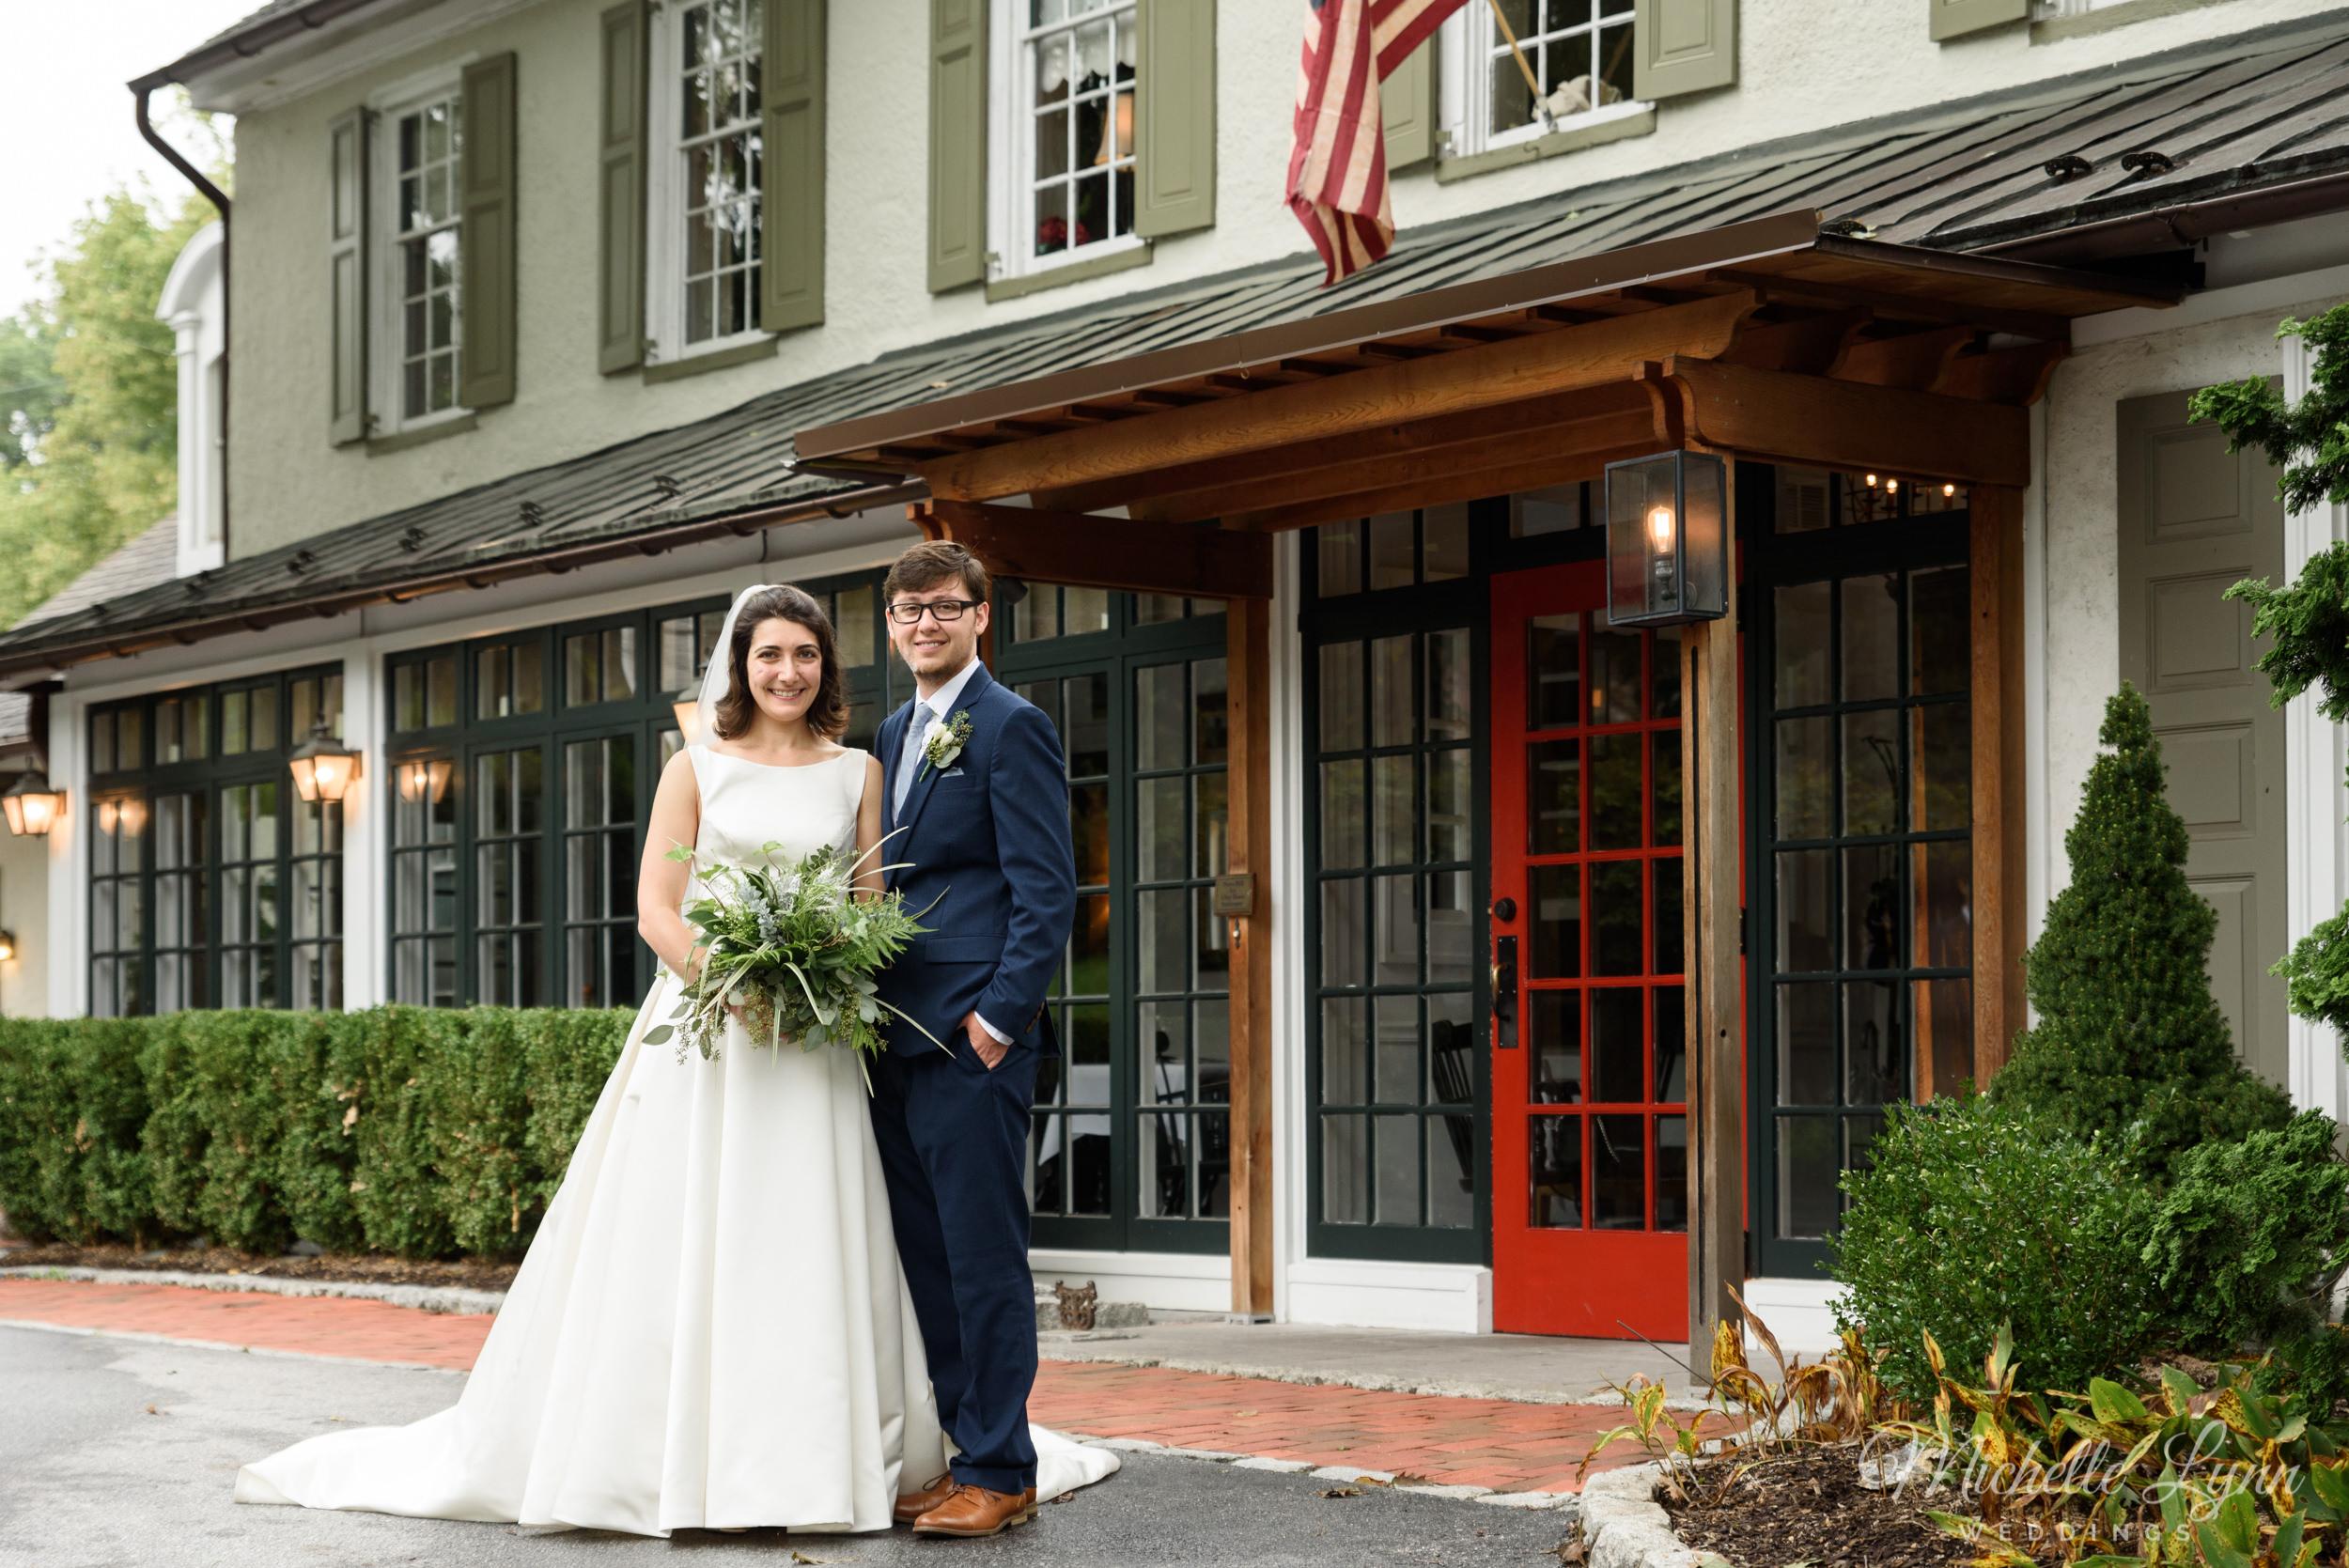 mlw-general-warren-malvern-wedding-photographer-16.jpg